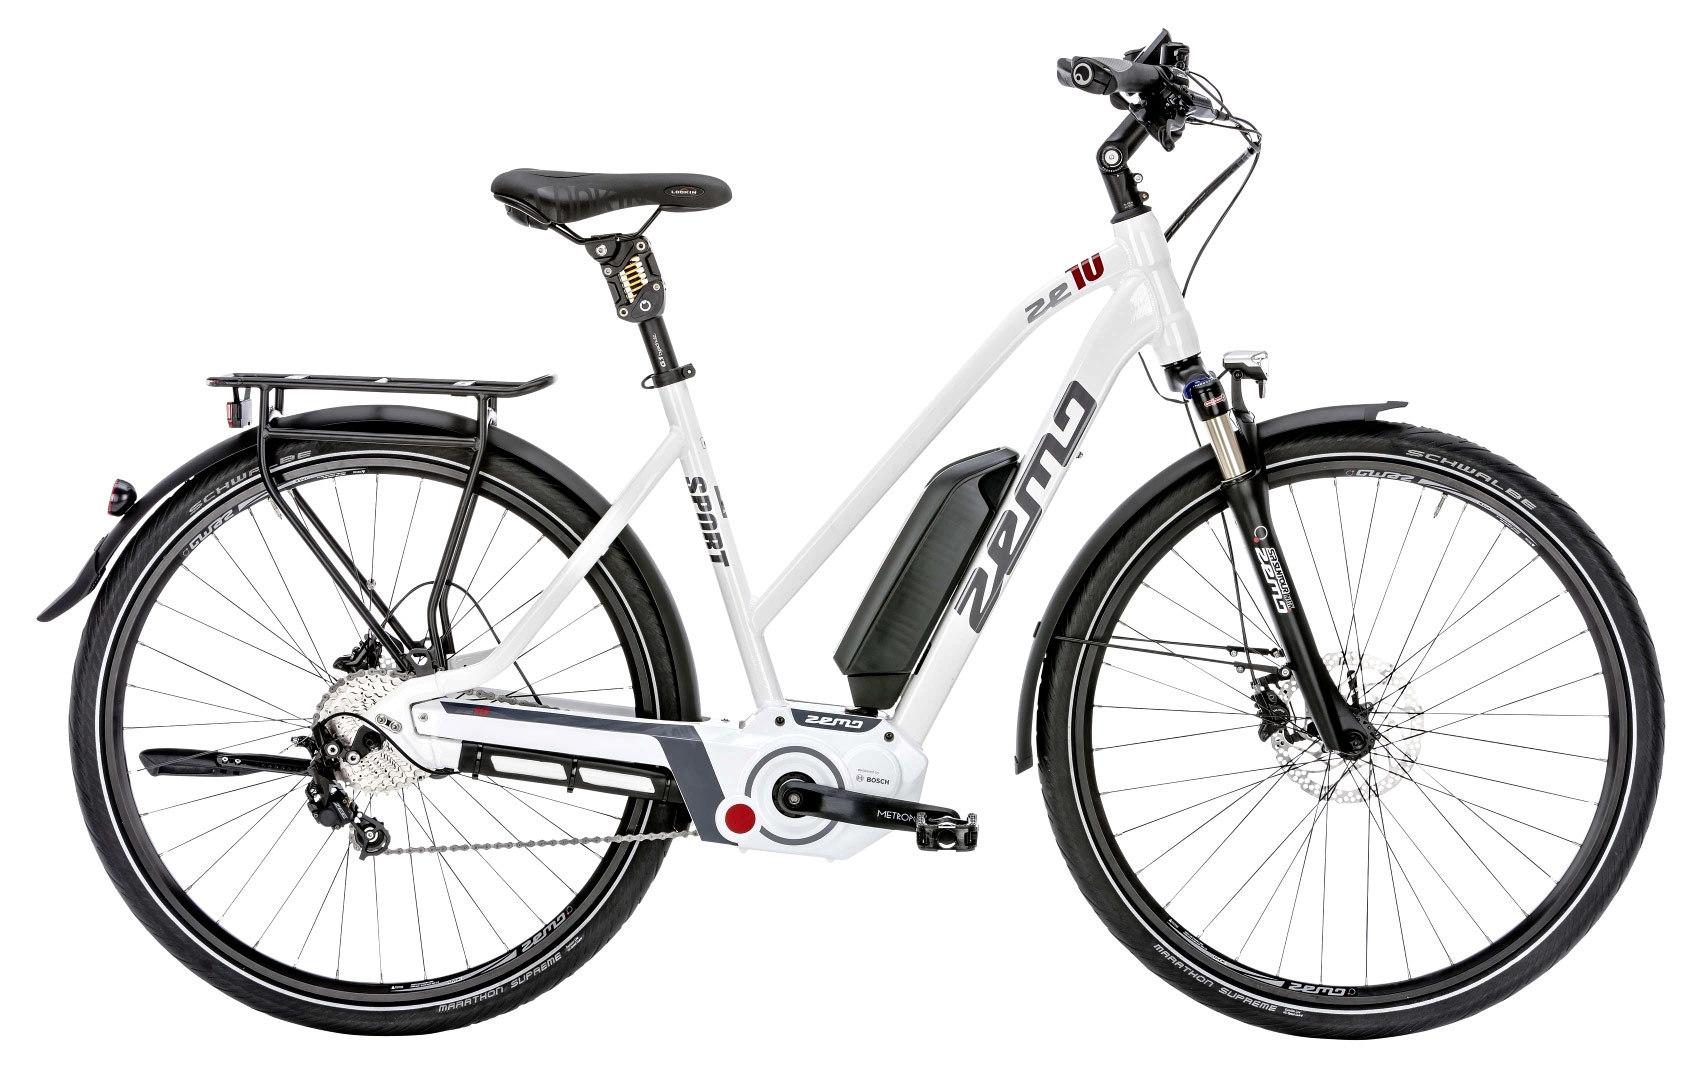 elektro fahrrad flyer b8 1 e bike bosch 11 ah shimano. Black Bedroom Furniture Sets. Home Design Ideas